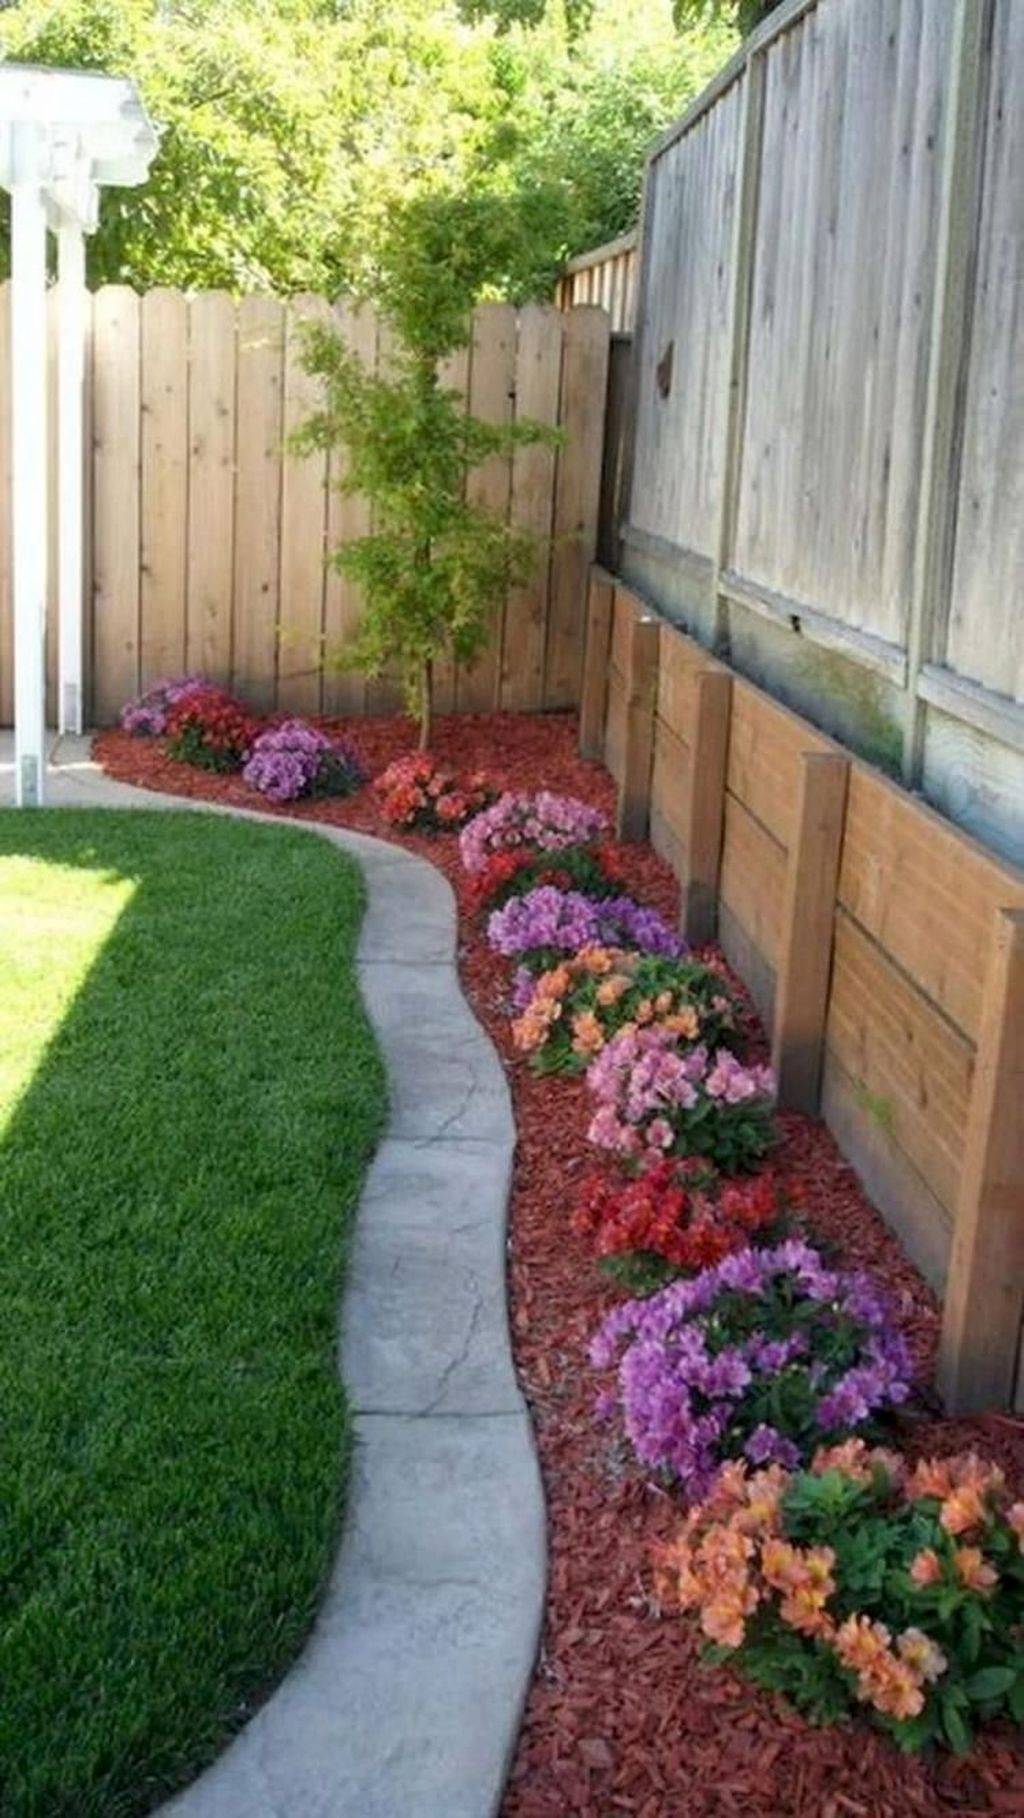 50 Backyard Landscaping Ideas with Minimum Budget | Small ... on Big Backyard Garden Ideas id=37328